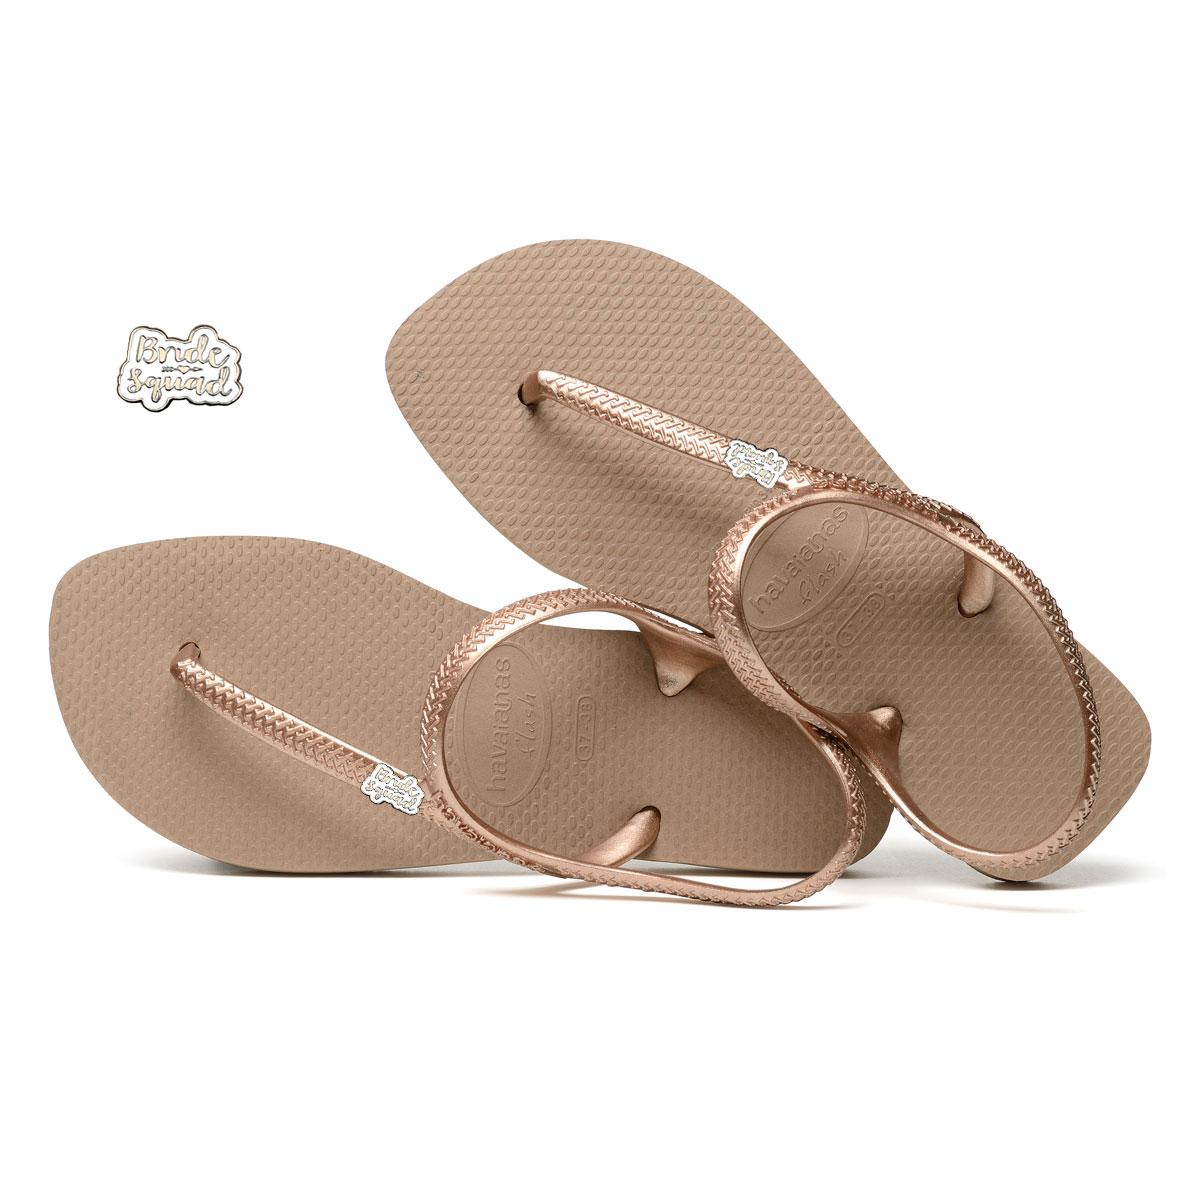 Bride Squad Silver White Pin Havaianas Urban Rose Gold Flip Flops Gift